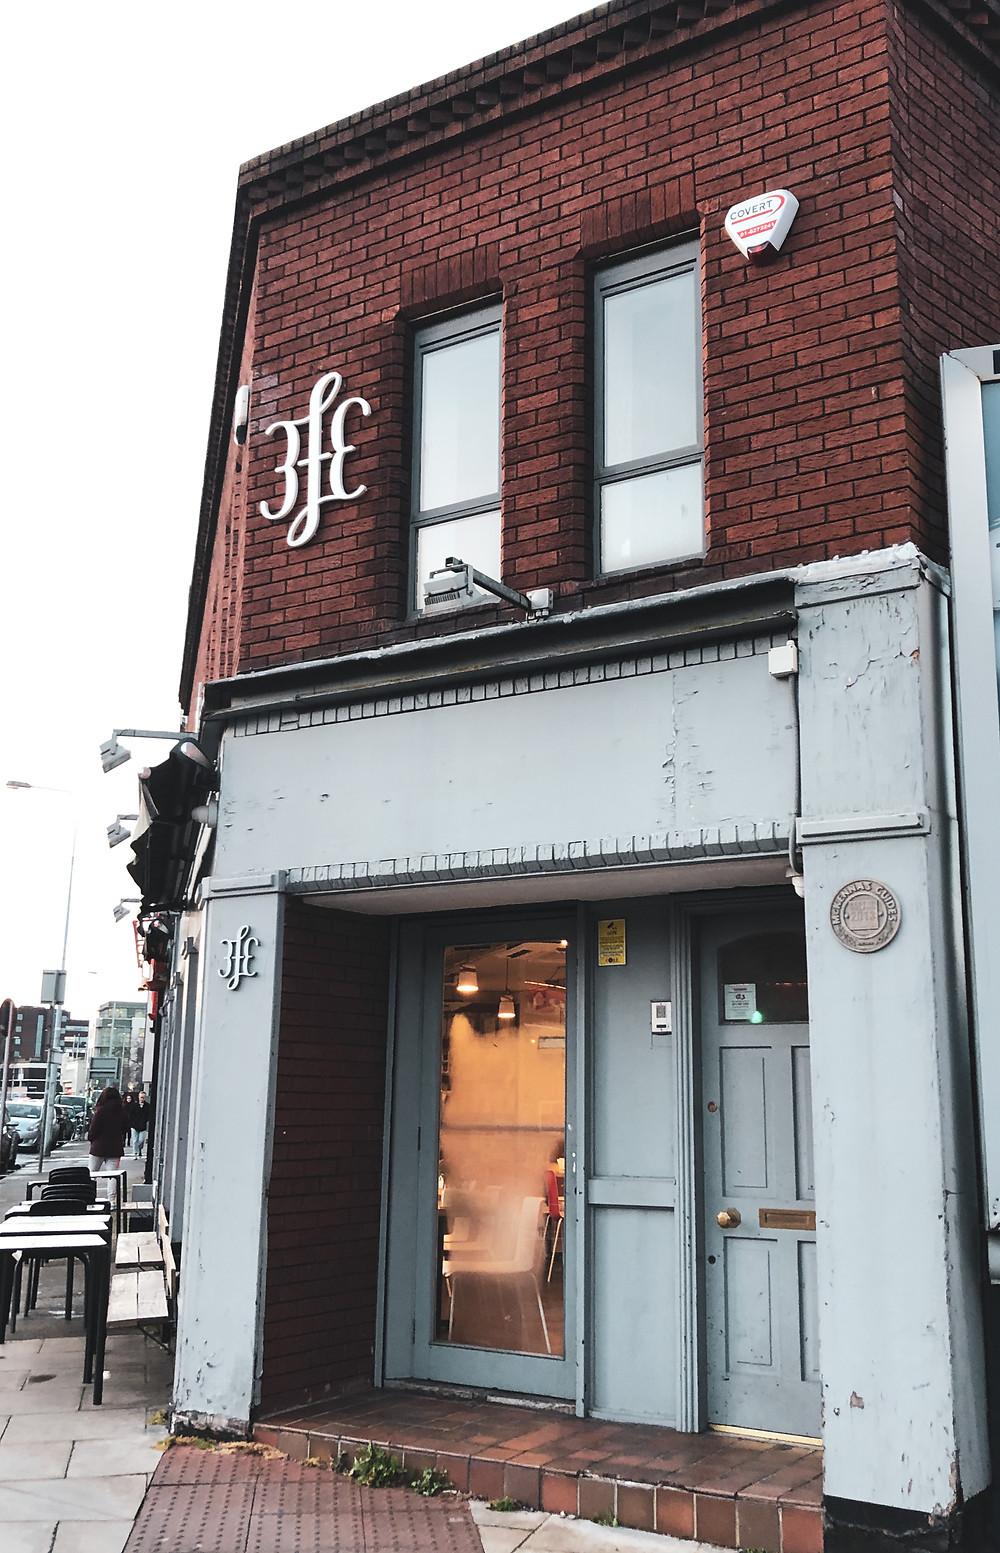 The outside of 3fe Cafe in Dublin